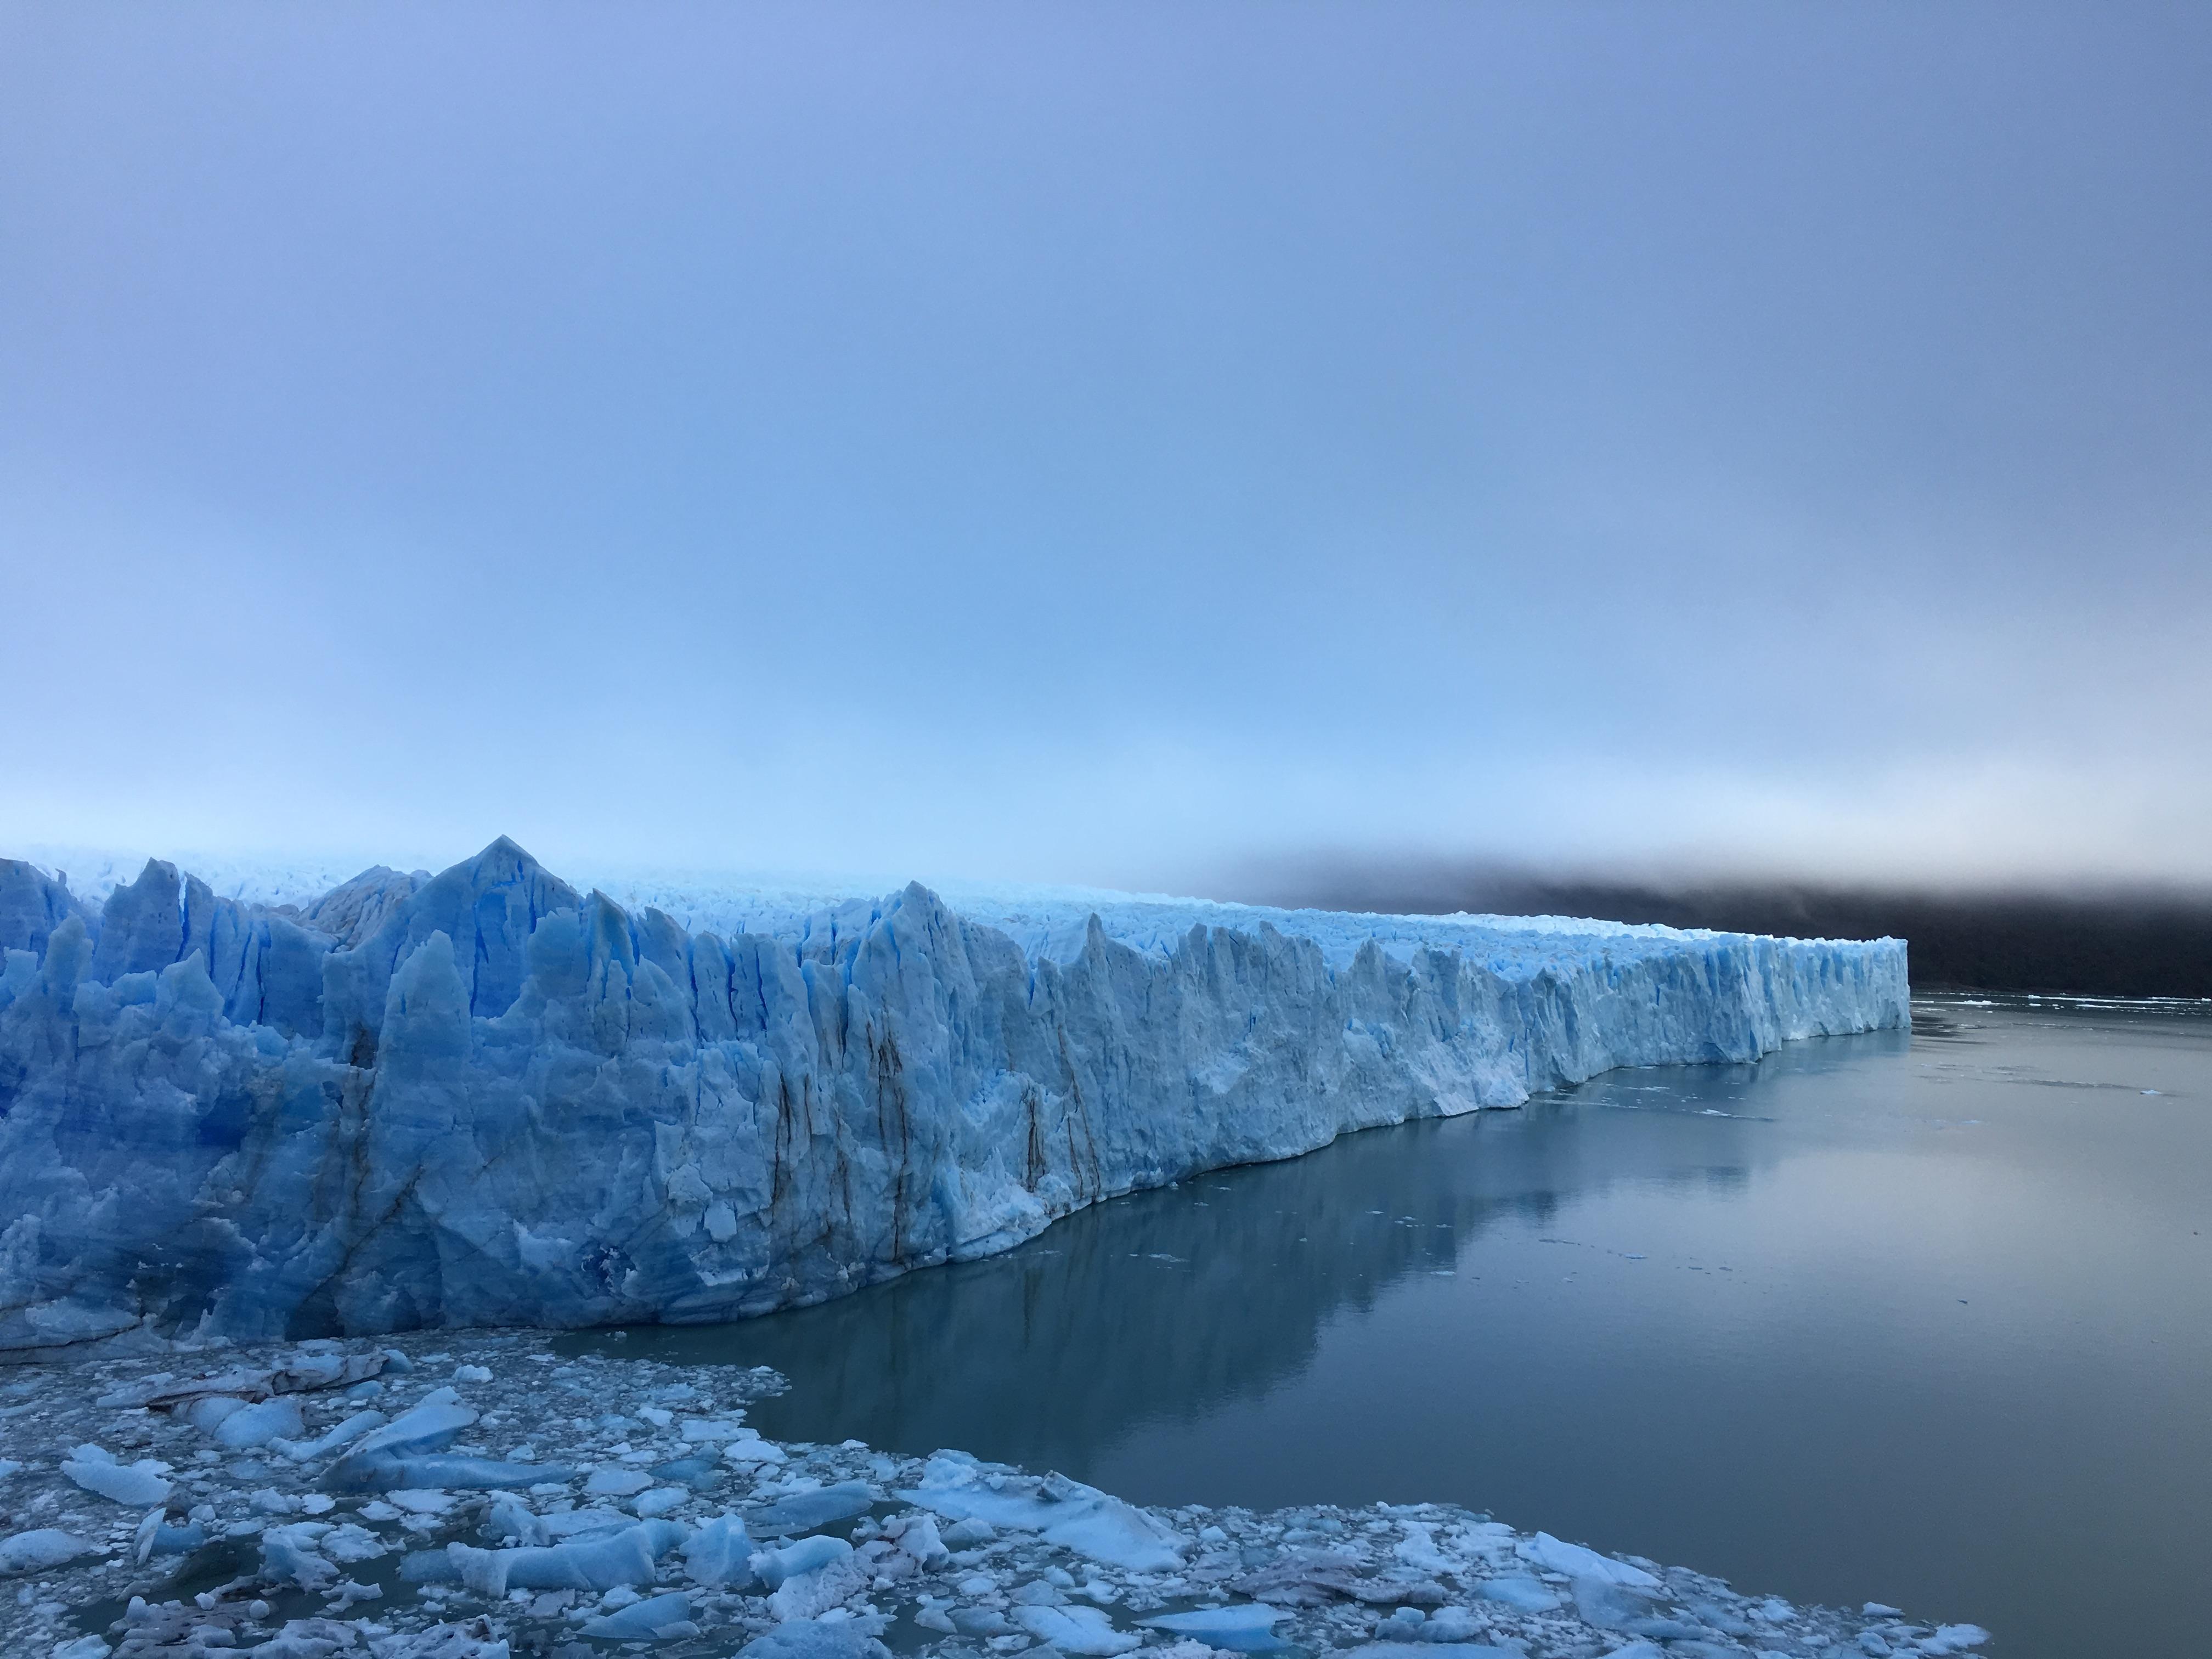 Bastien__lg - PVT Argentine - El calafate glacier perito moreno